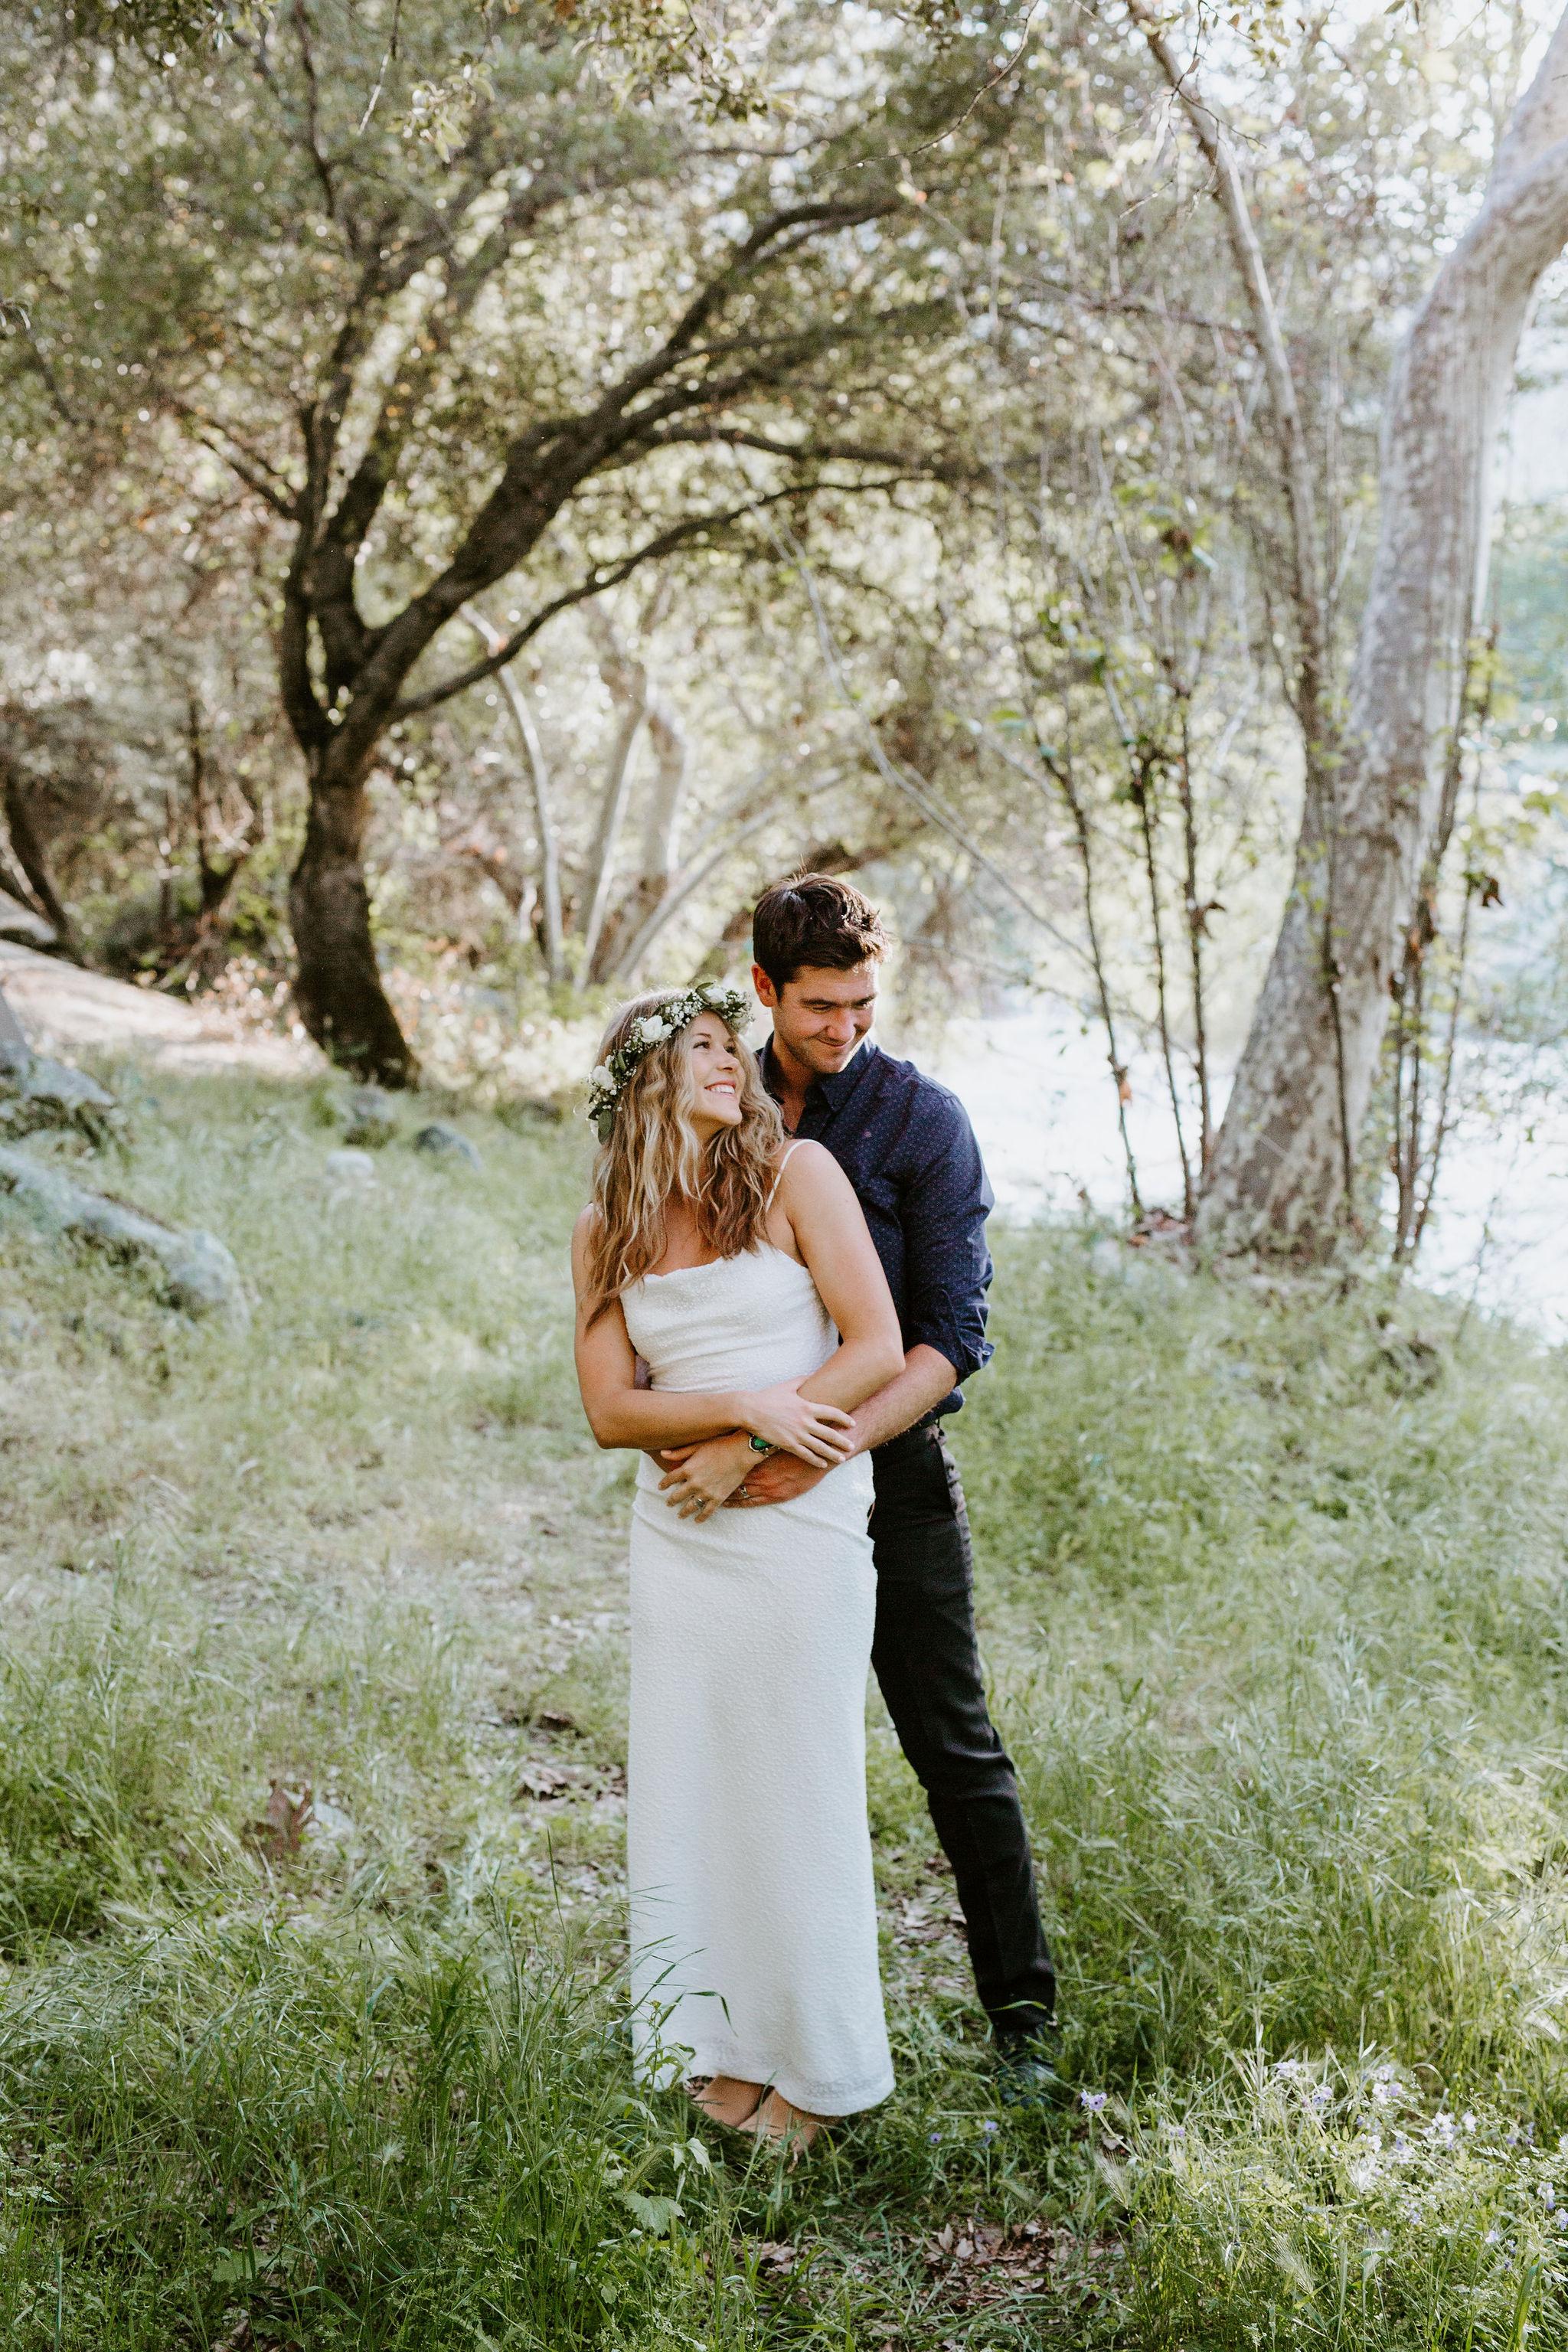 RedwoodRanch_Geoff&LyndsiPhotography_Mike&Amanda_Romantics25.jpg